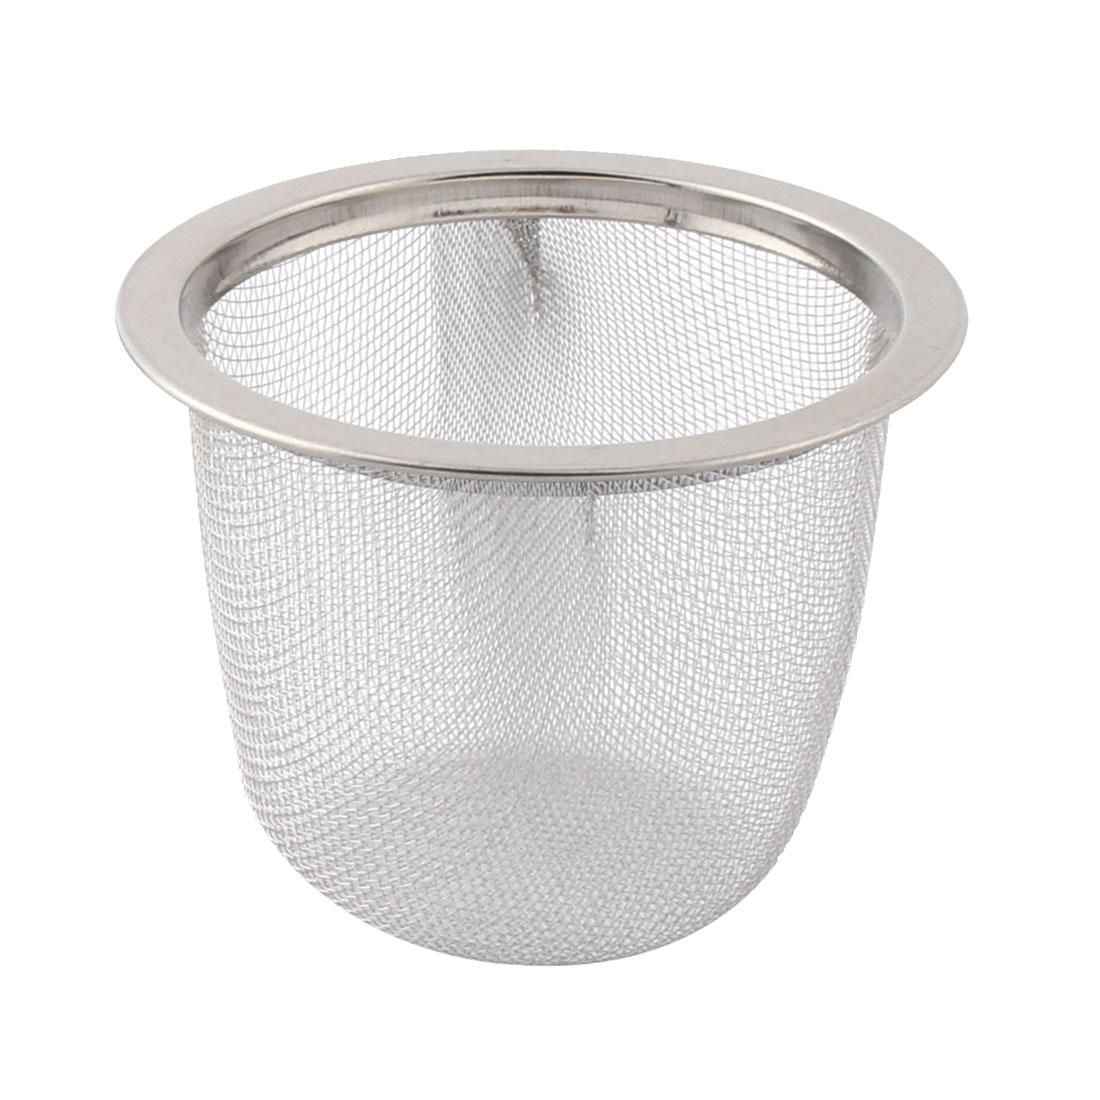 Tea Leaf Spice Stainless Steel Round Wire Mesh Filter Strainer 6cm Dia